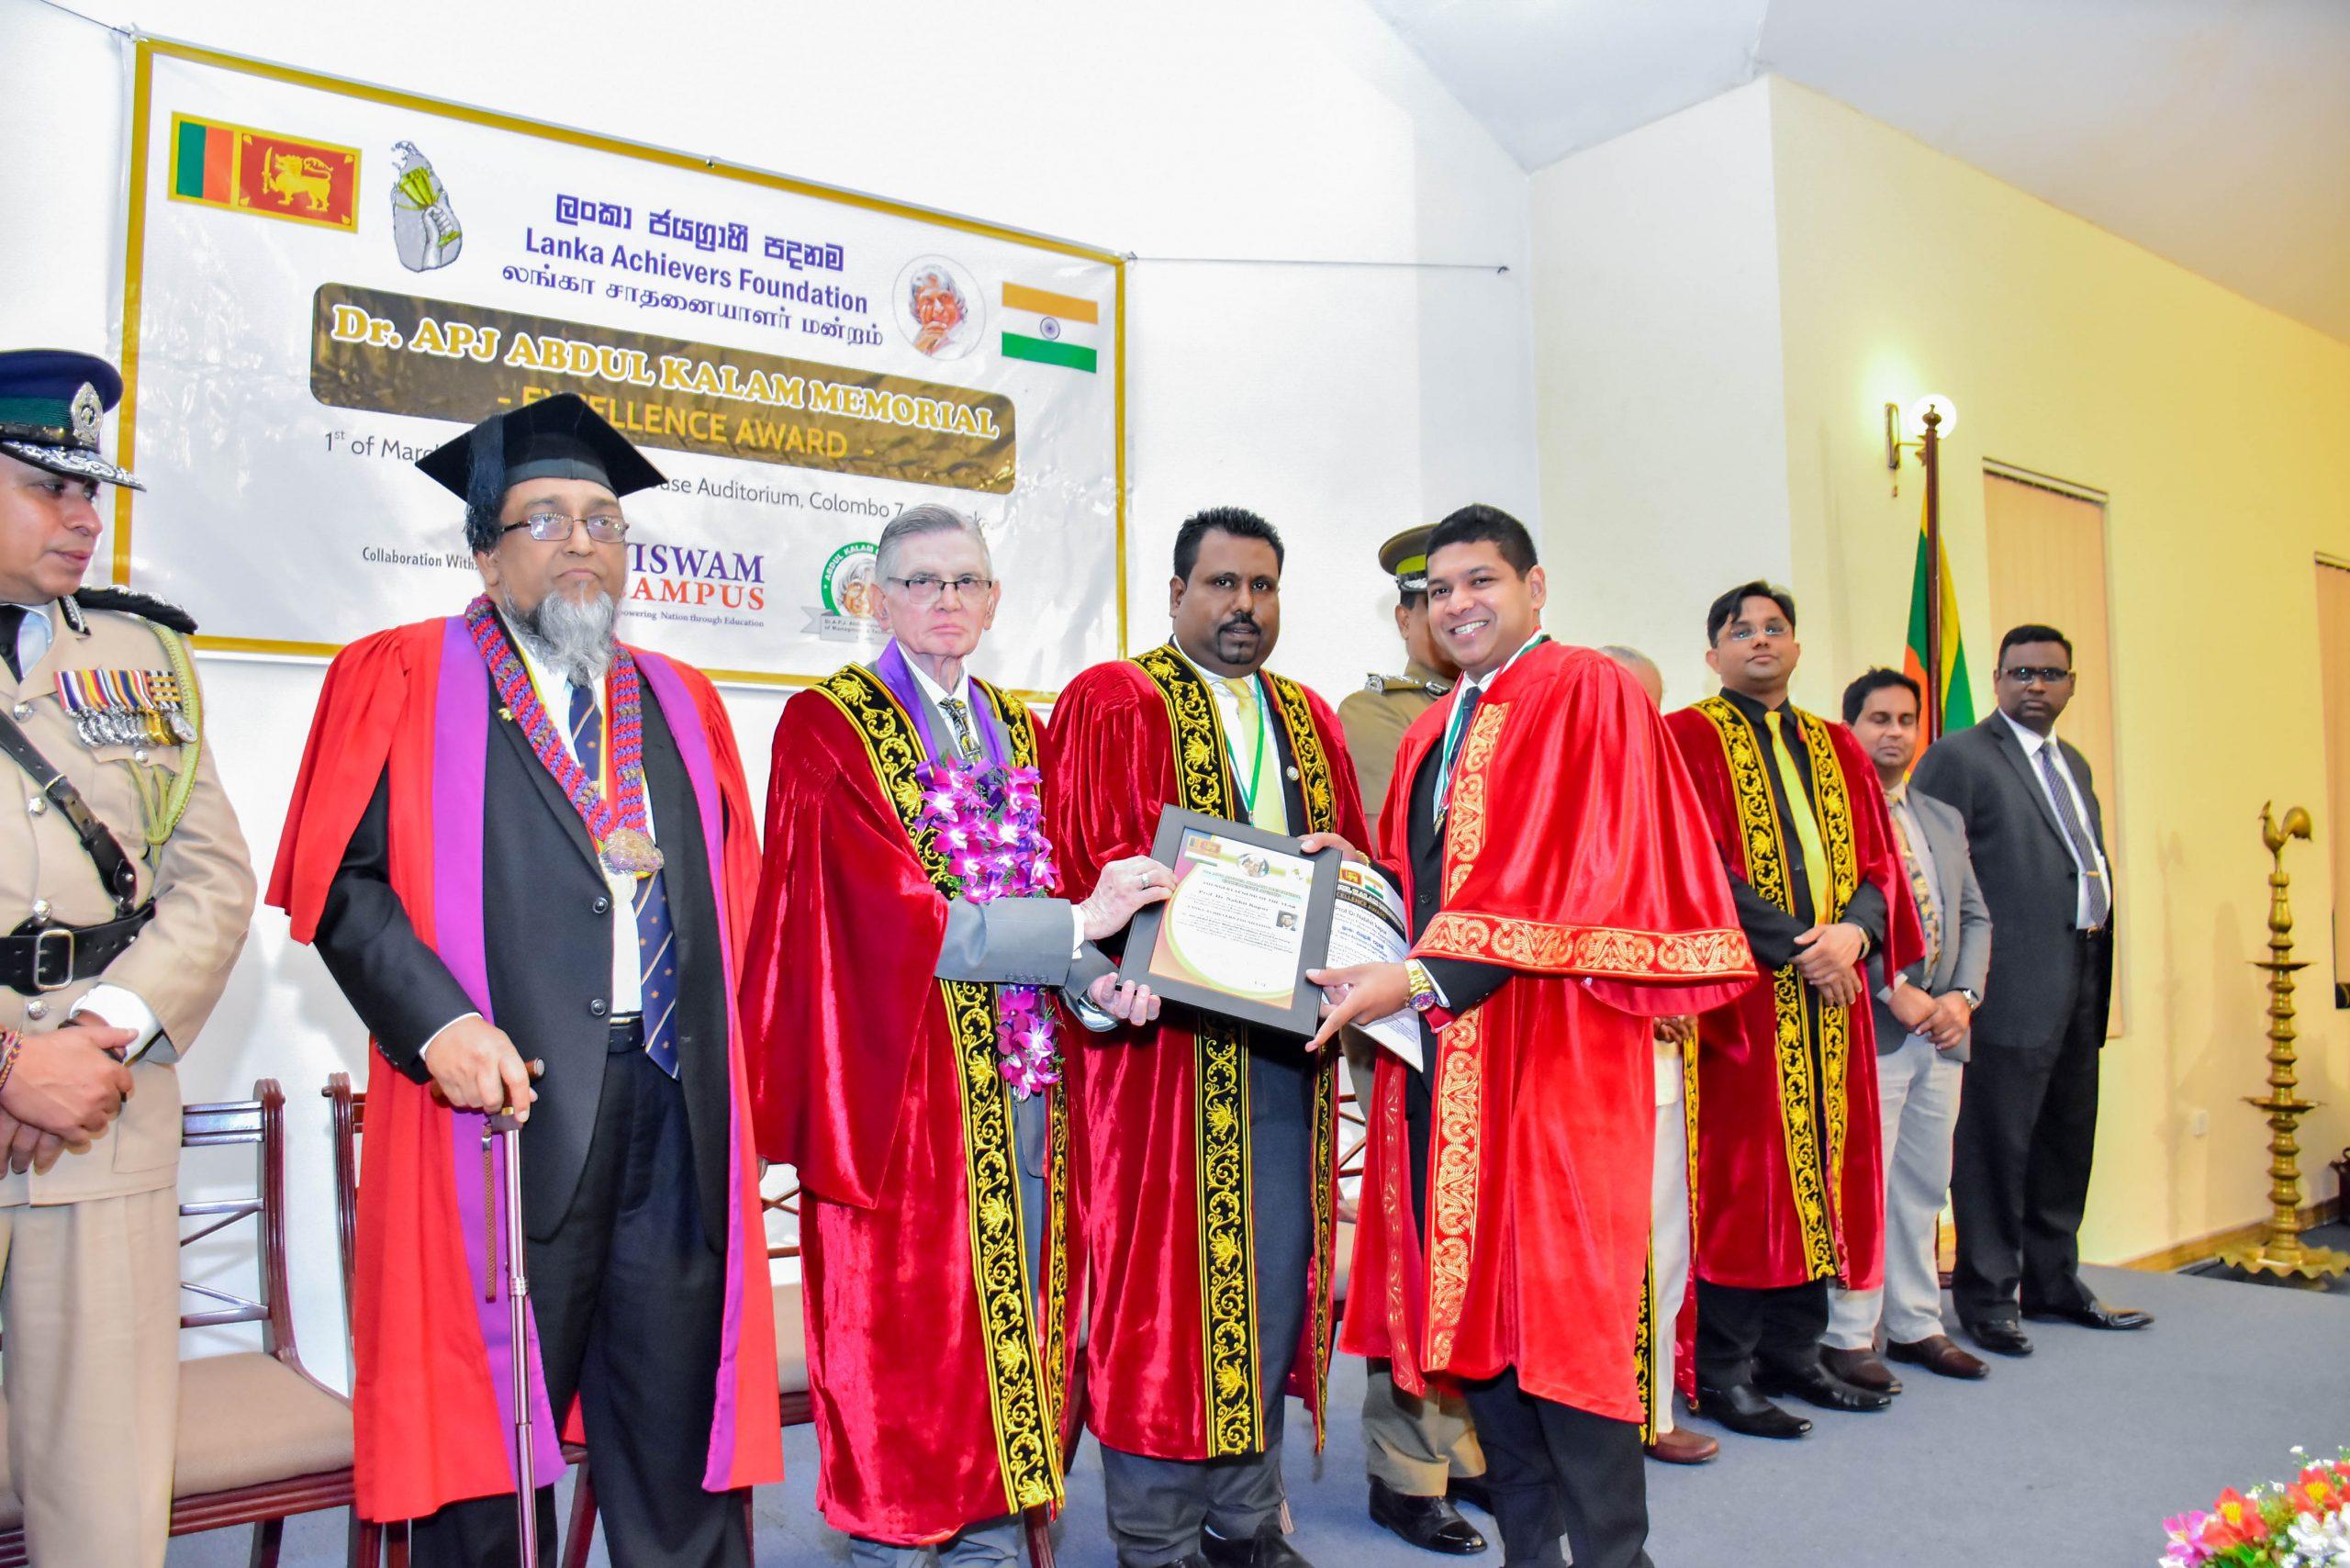 Dr. Abdul Kalam 2019 (15)